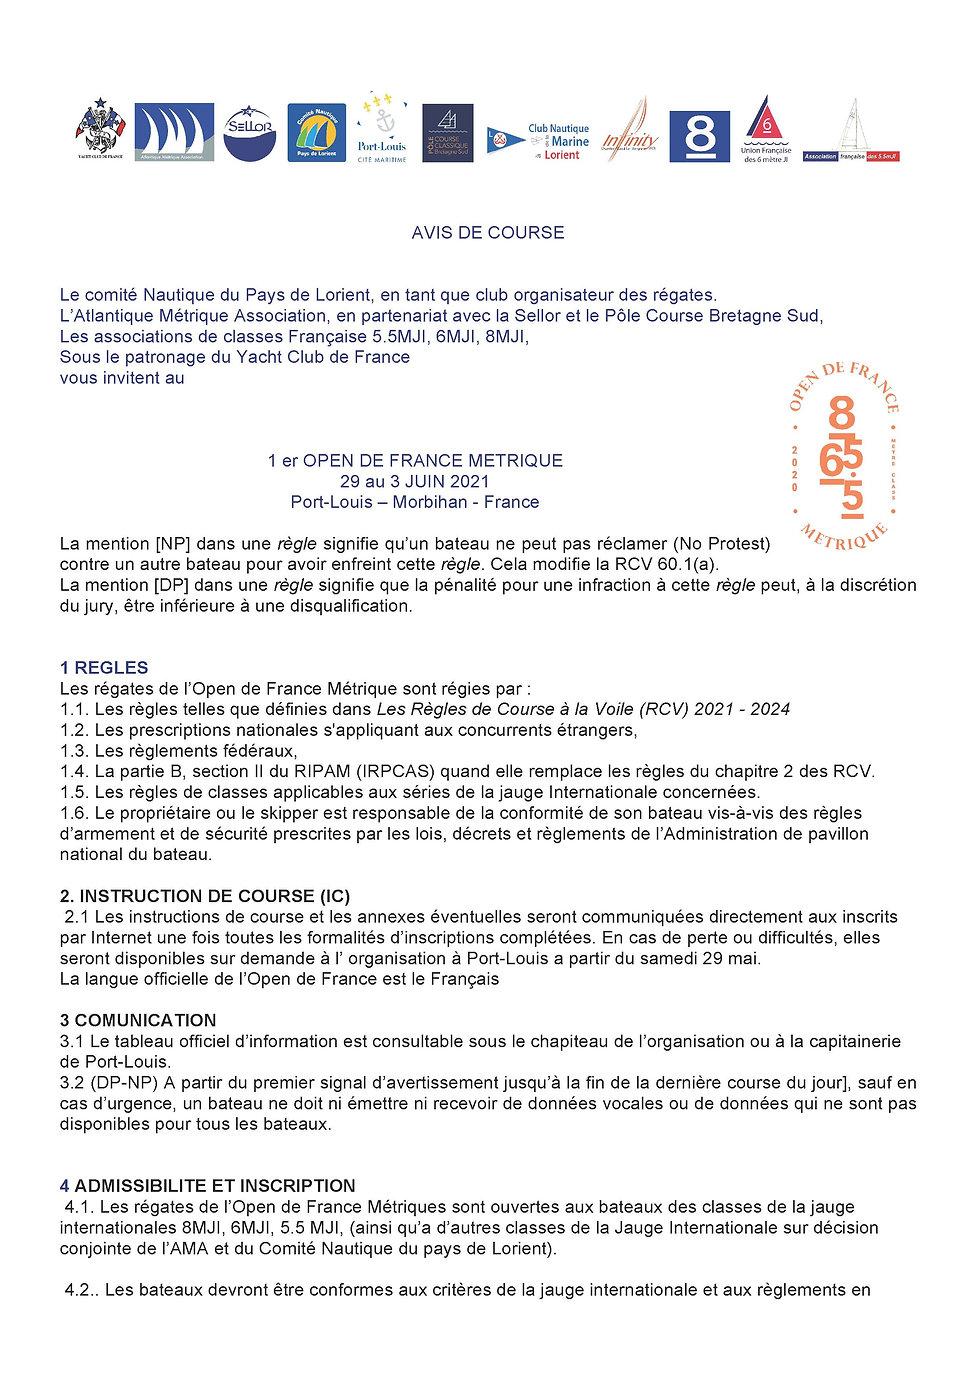 OPEN 2021 AVIS DE COURSE 18Mars 2021_Pag